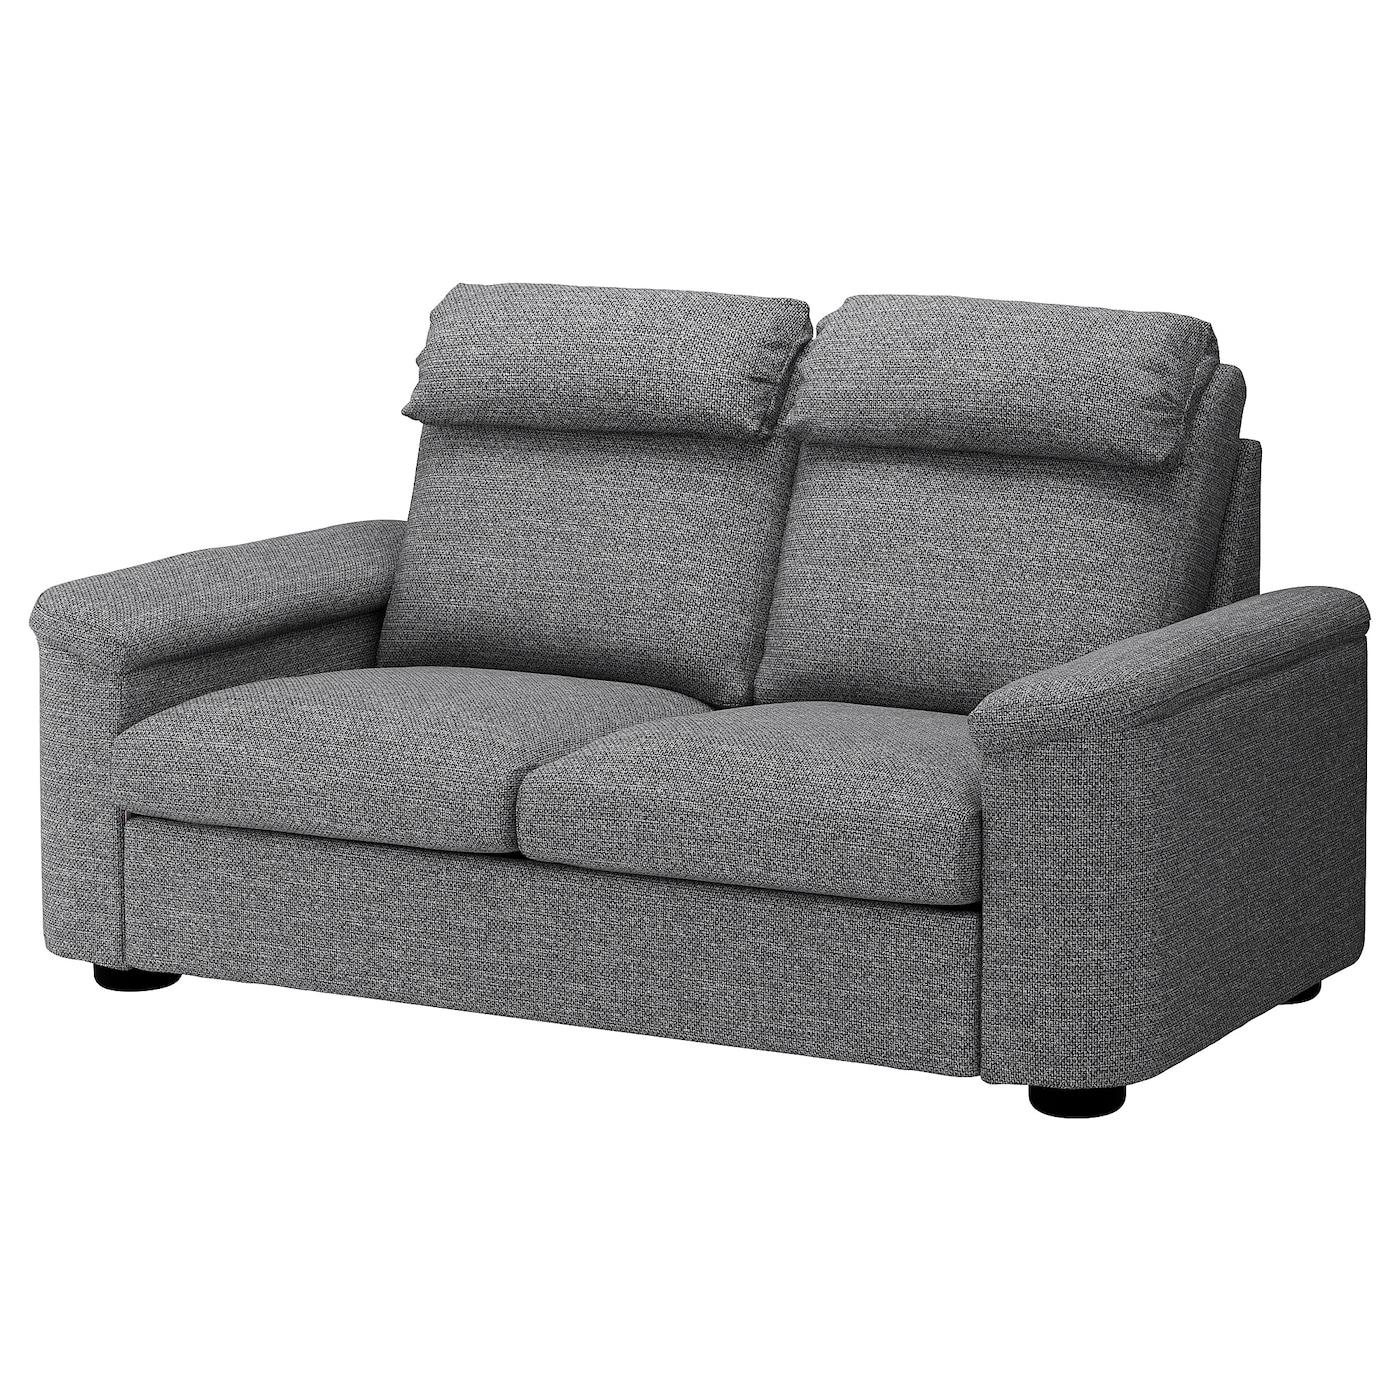 IKEA LIDHULT Sofa 2-osobowa, Lejde szary-czarny